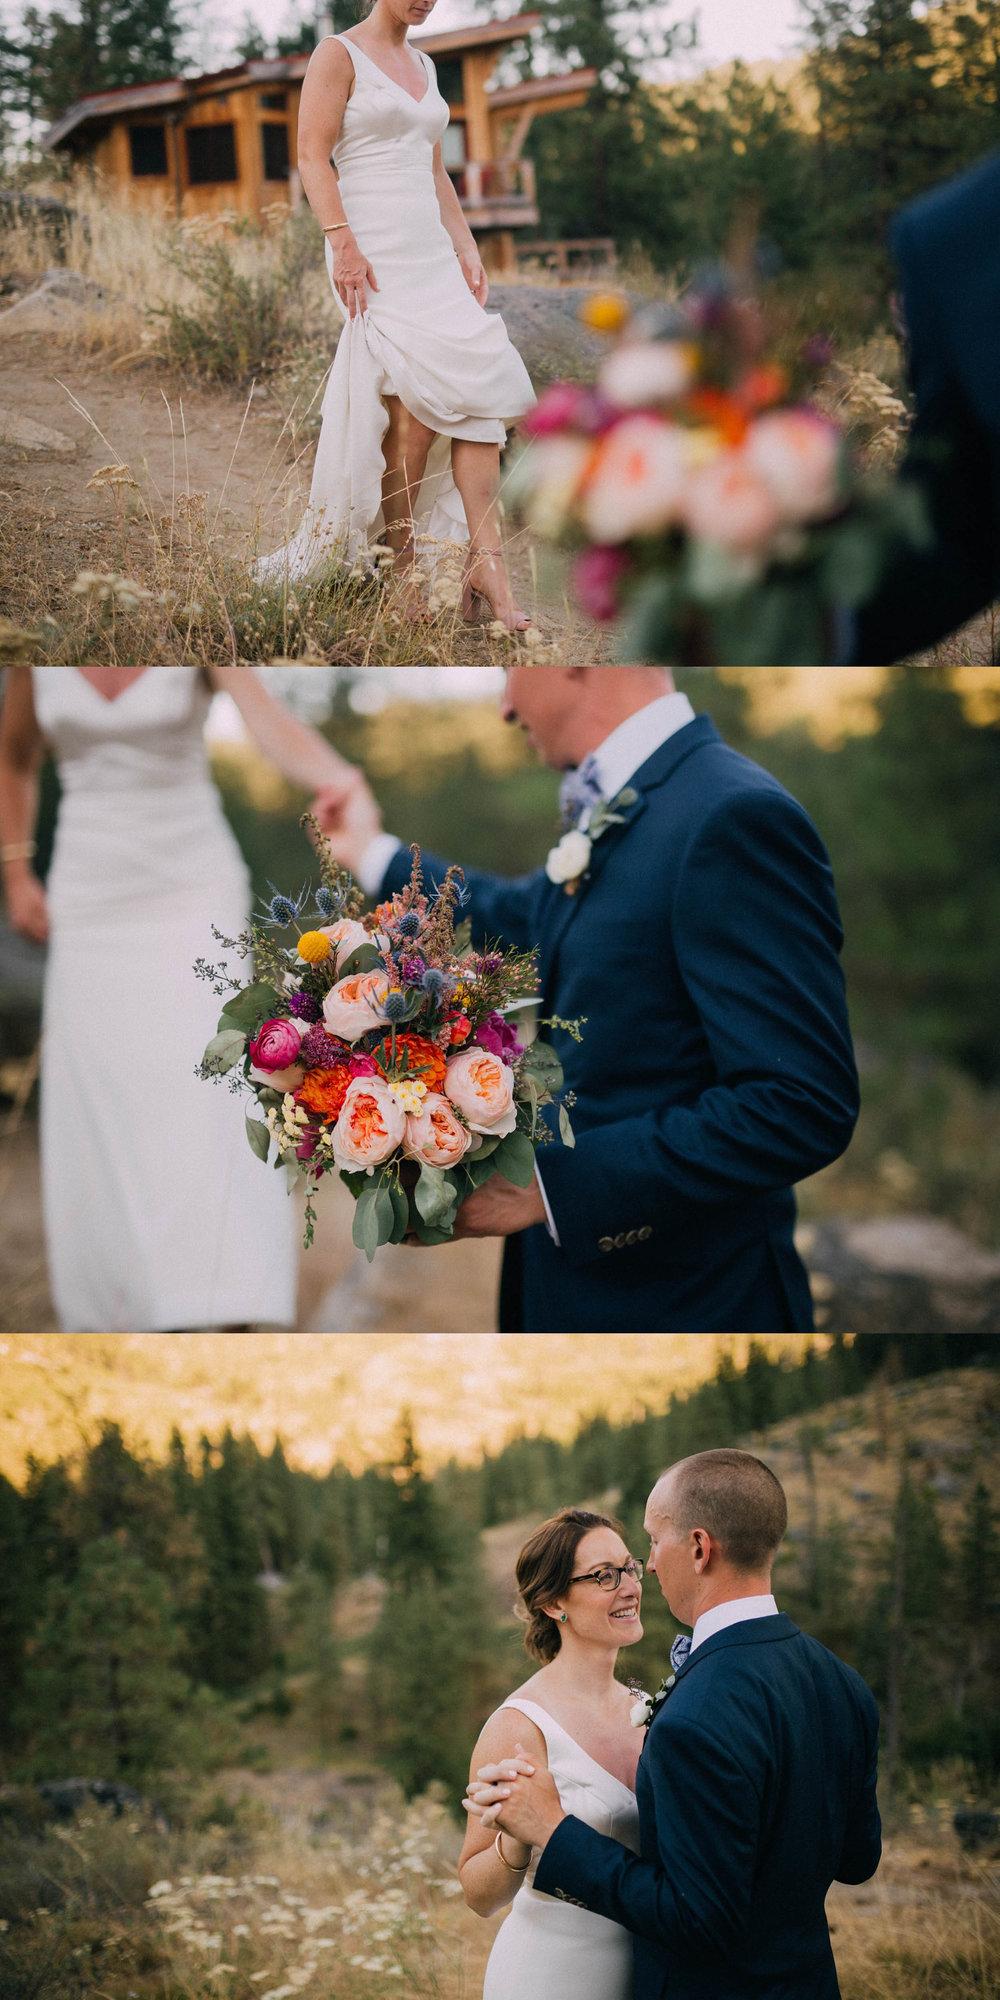 seattle+and+pacific+northwest+wedding+photographer+western+washington+wedding-26.jpg